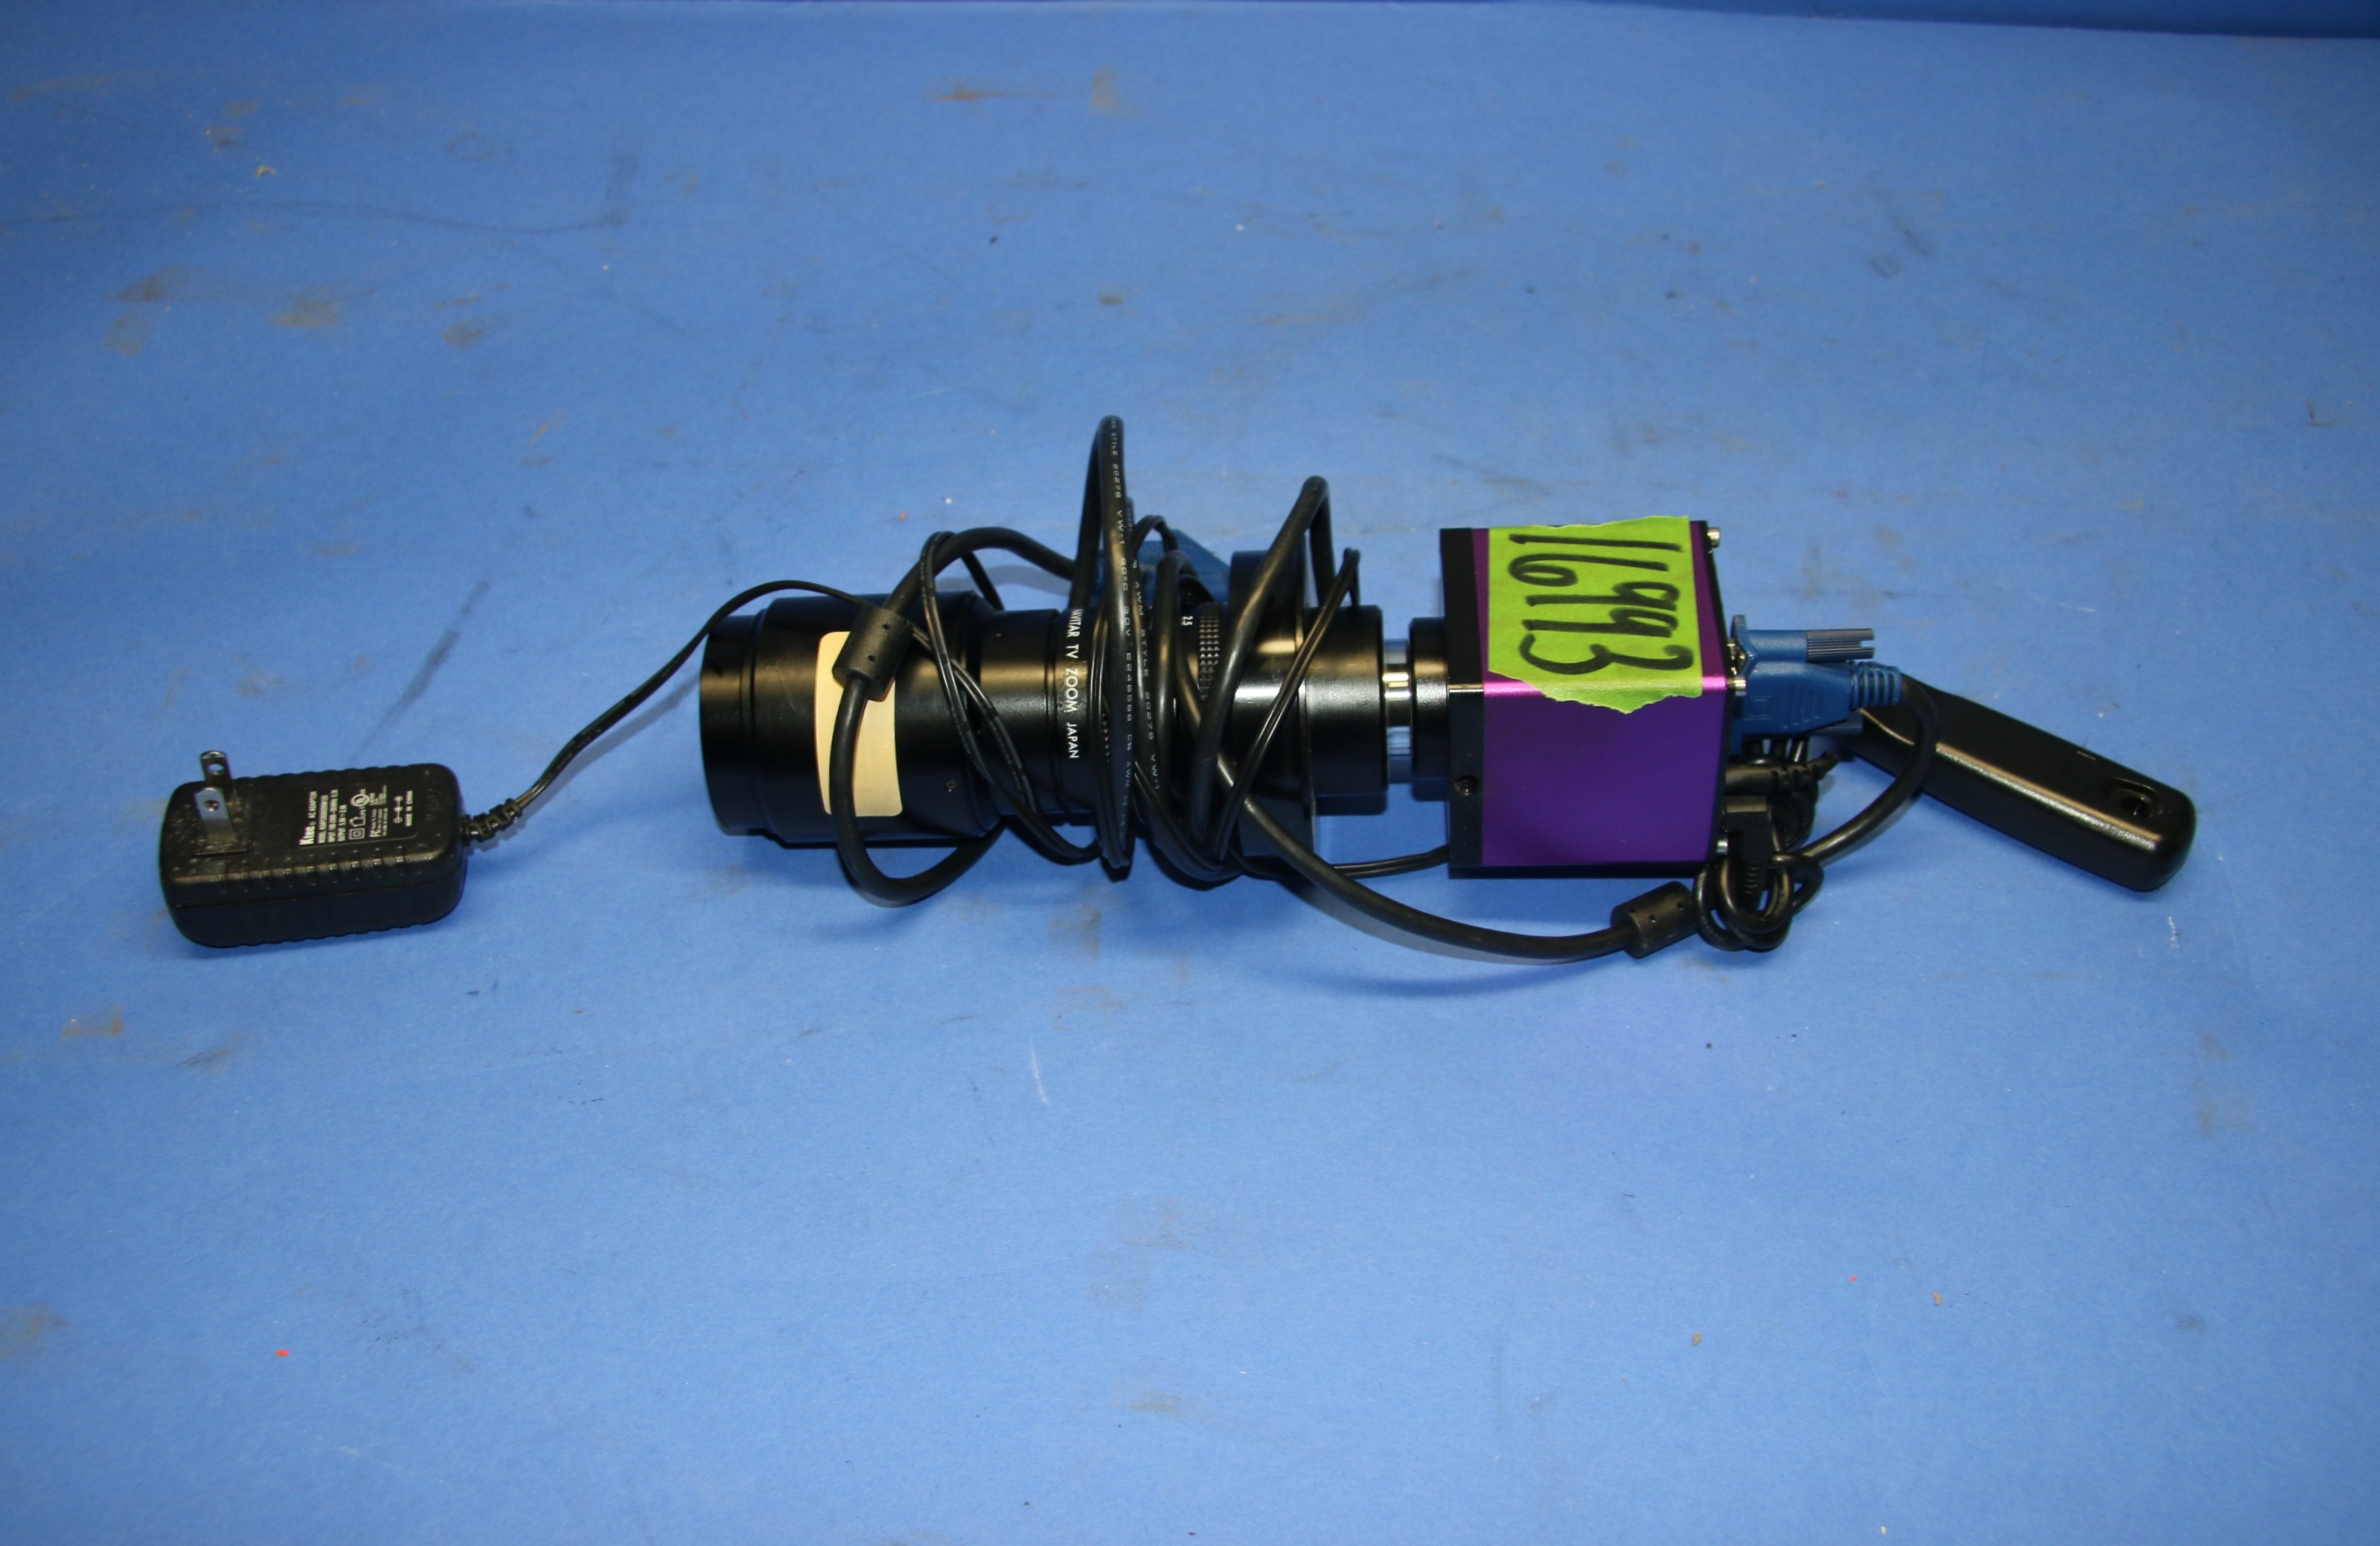 (1) Used Scinscope Camera (1) Used Navitar 7000 TV 16993